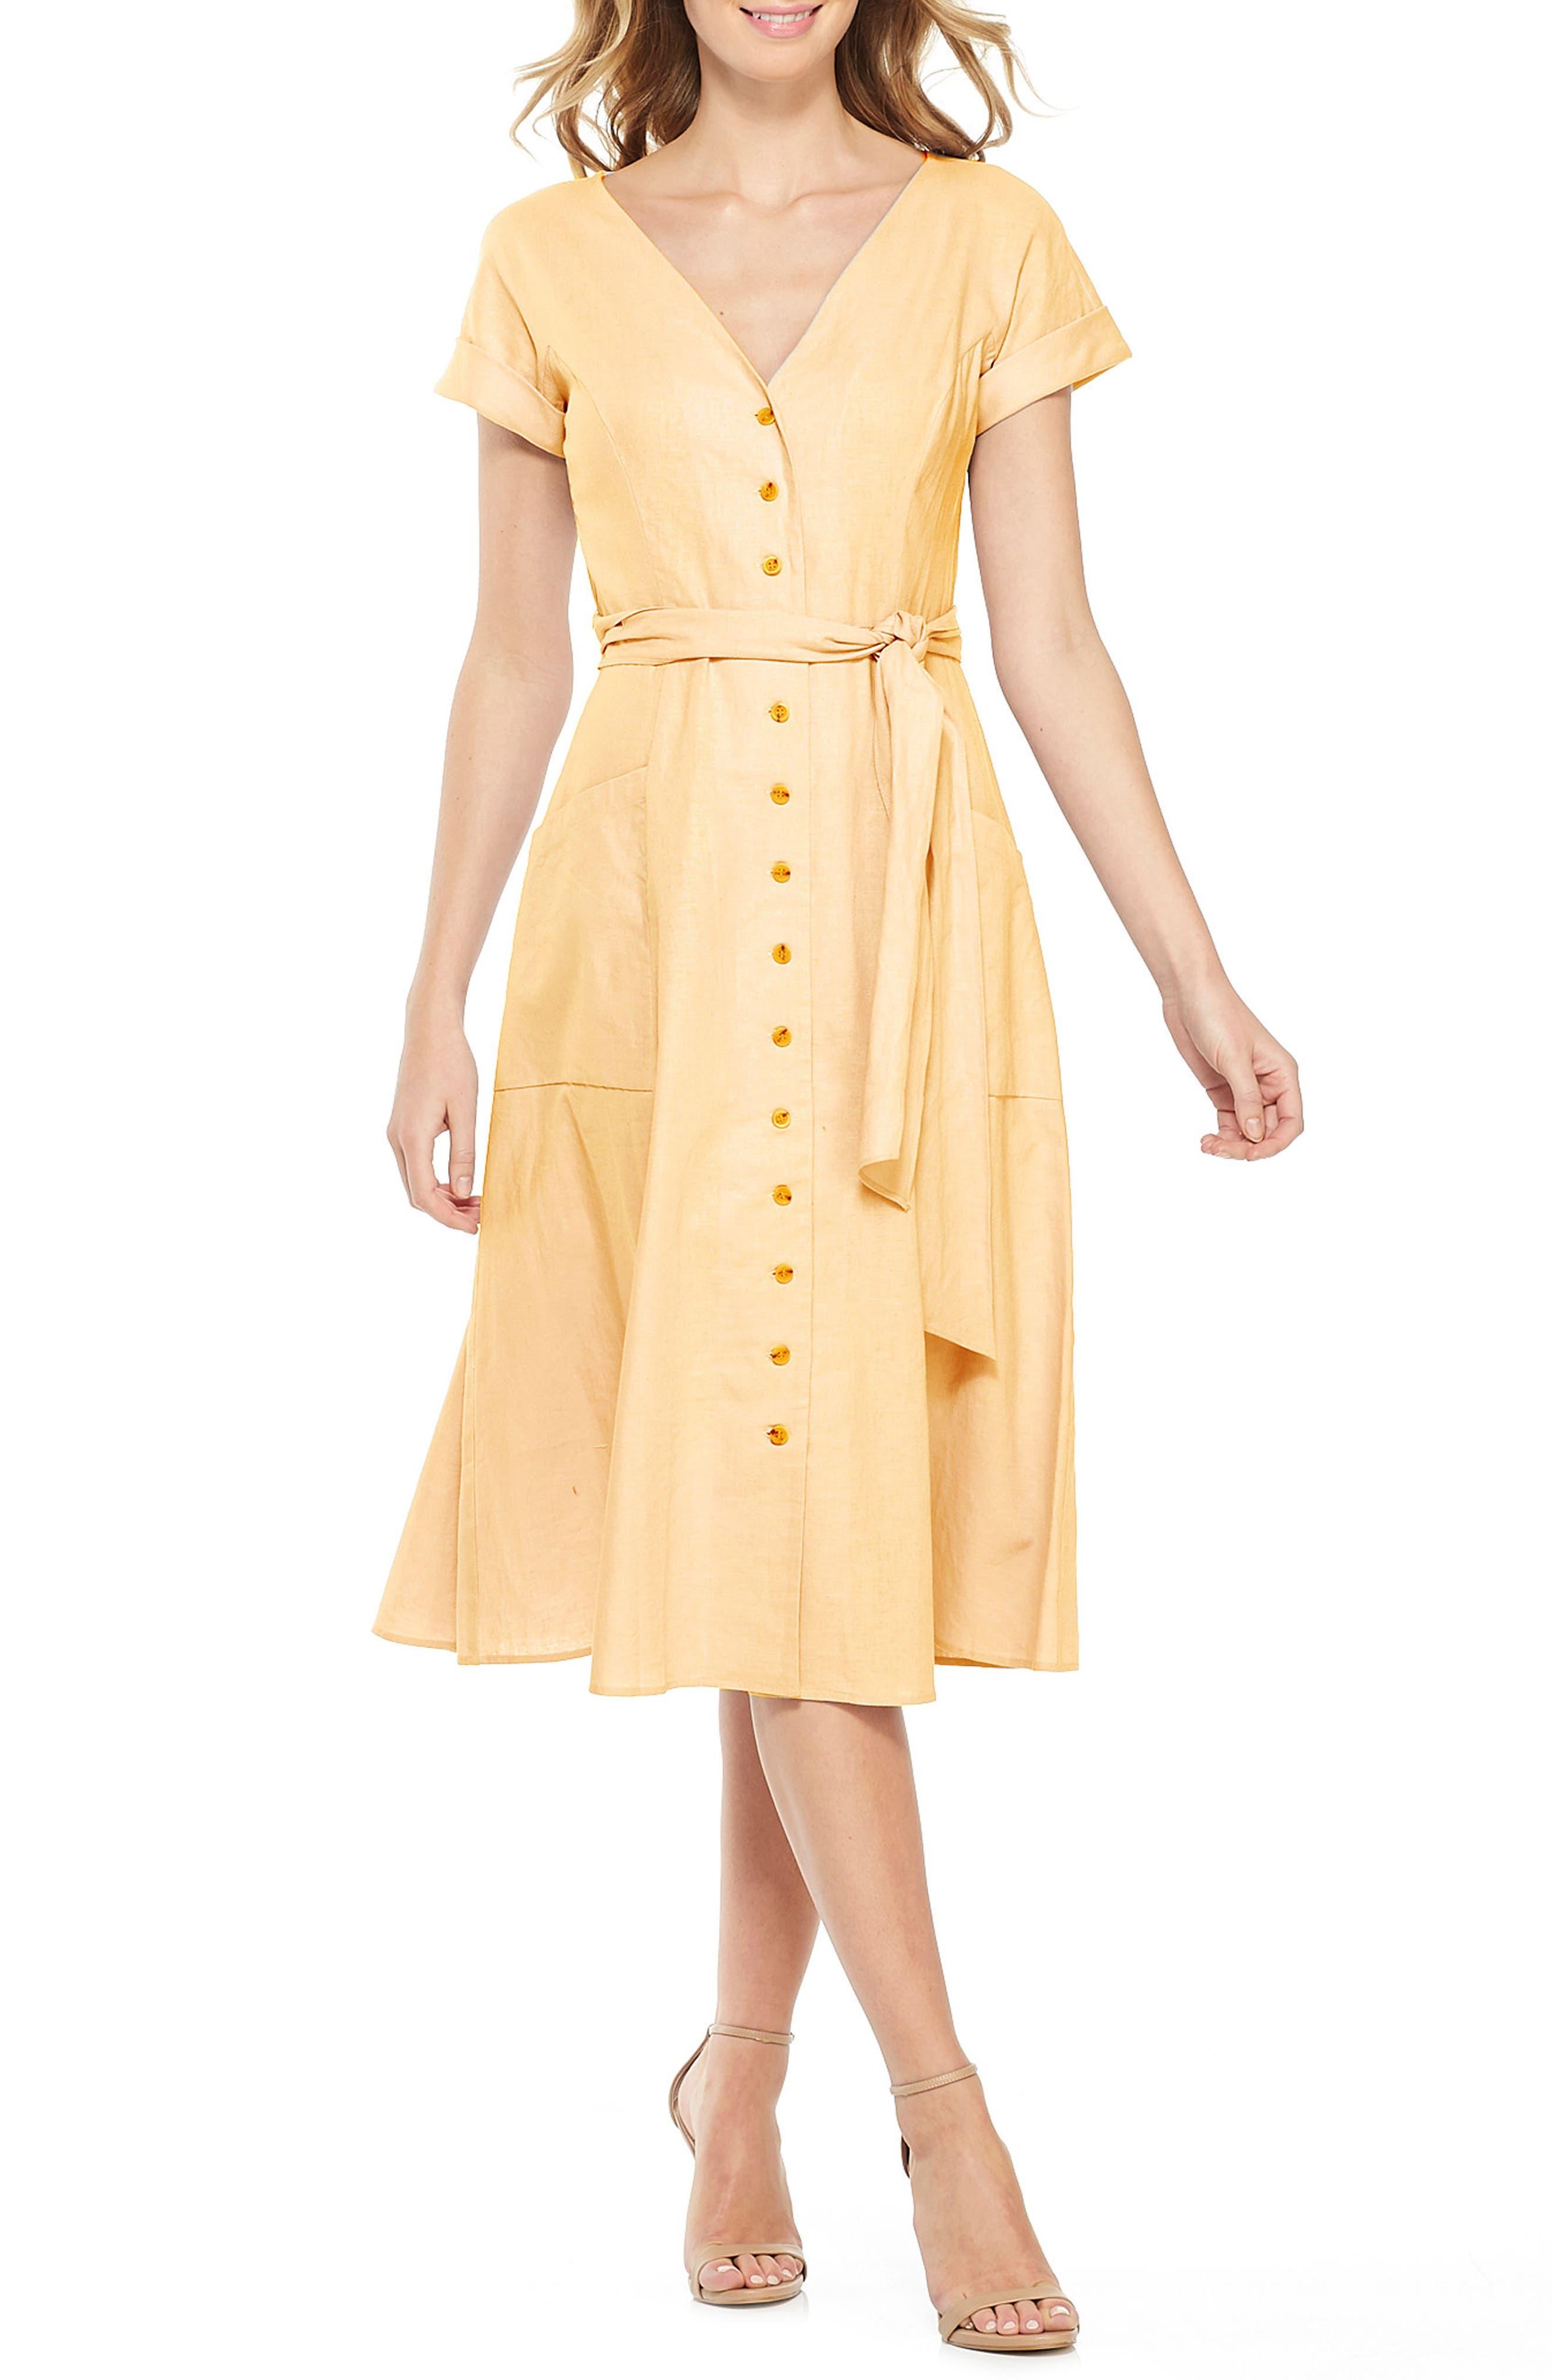 Gal Meets Glam Collection Vanessa Button Front Linen Blend Midi Dress